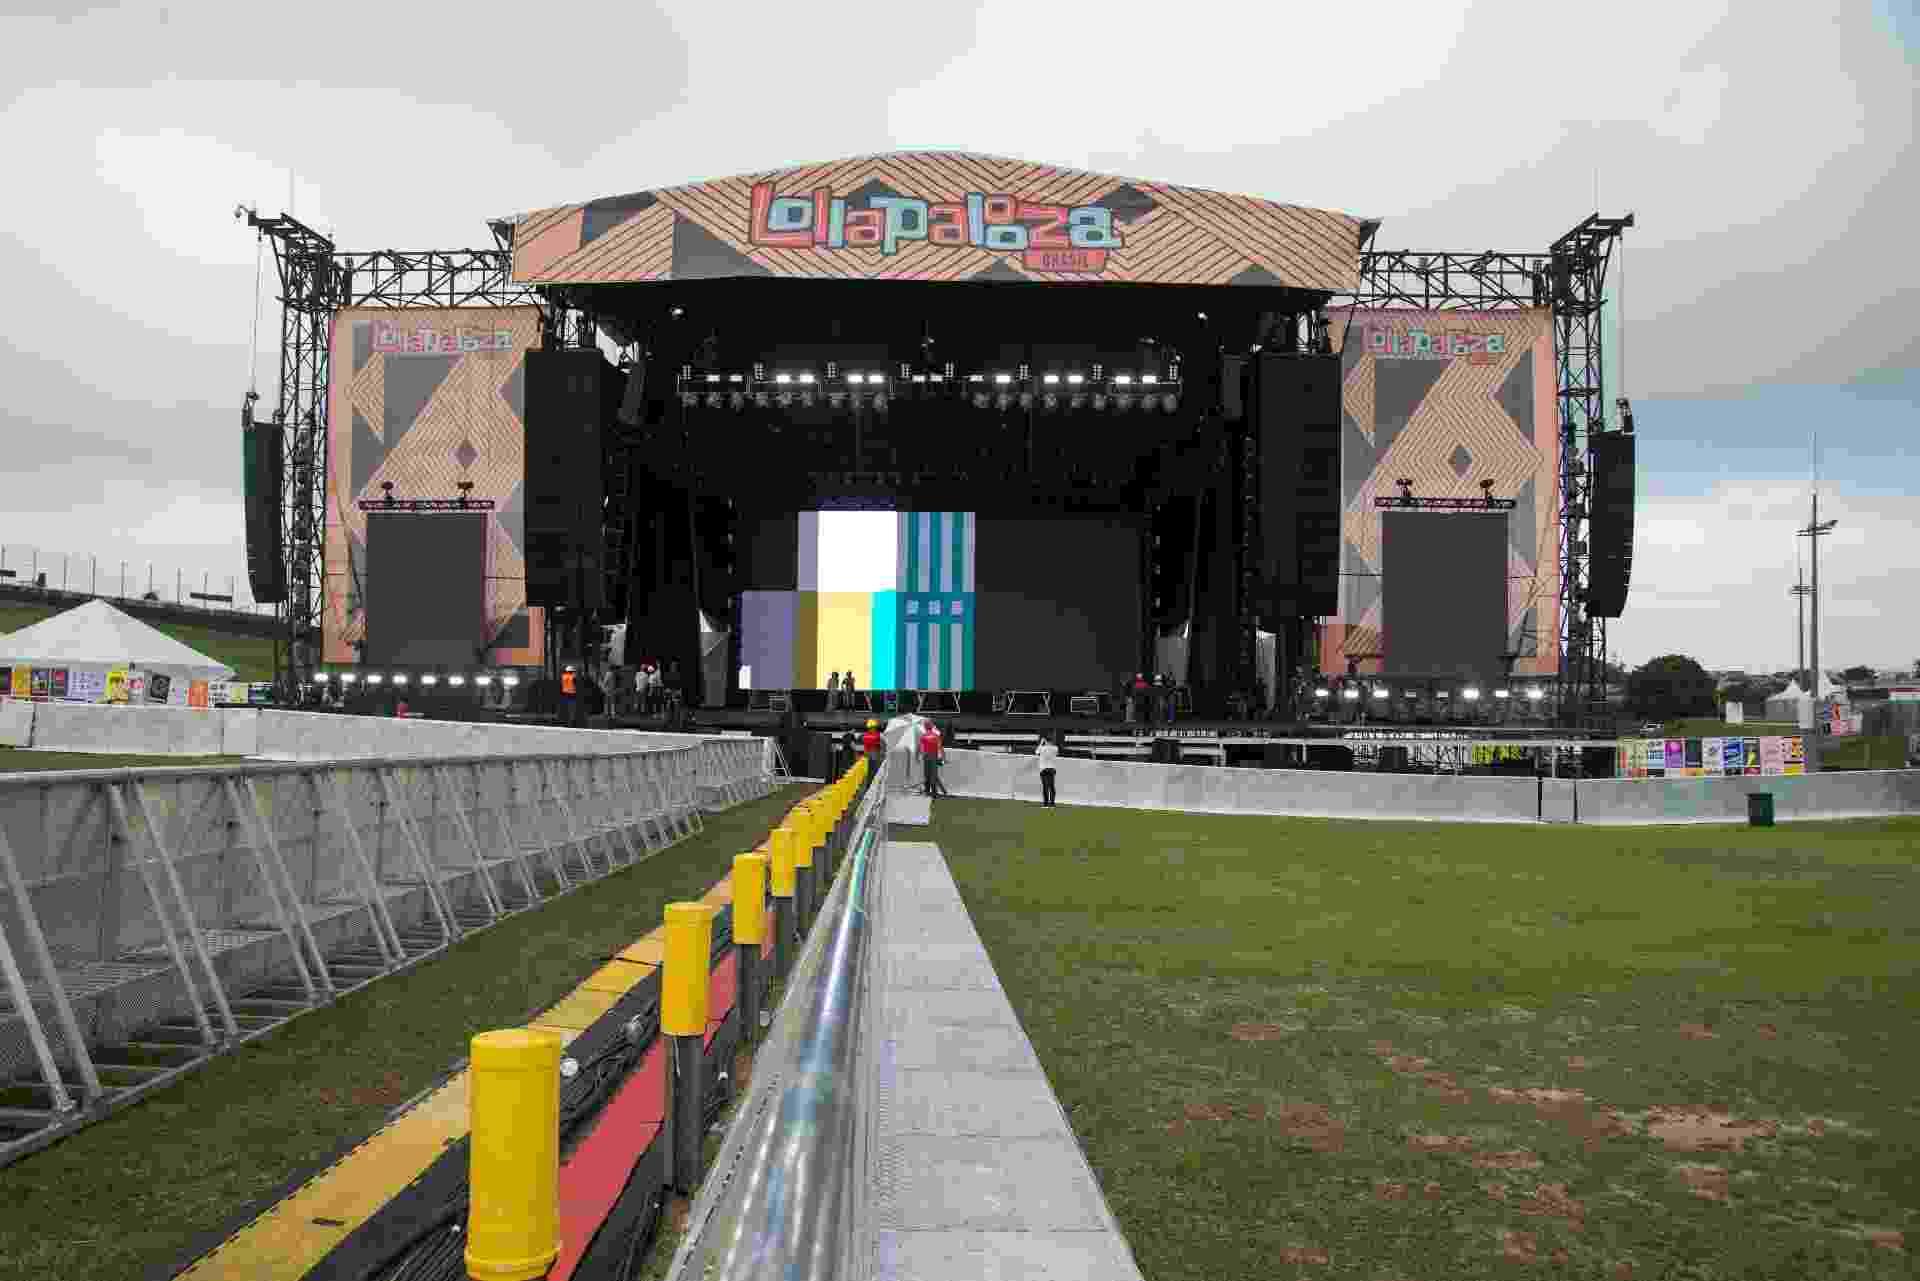 O palco Skol receberá os shows dos dois headliners do Lollapalooza Brasil 2017: Metallica no sábado e The Strokes no domingo - Débora Klempous/UOL